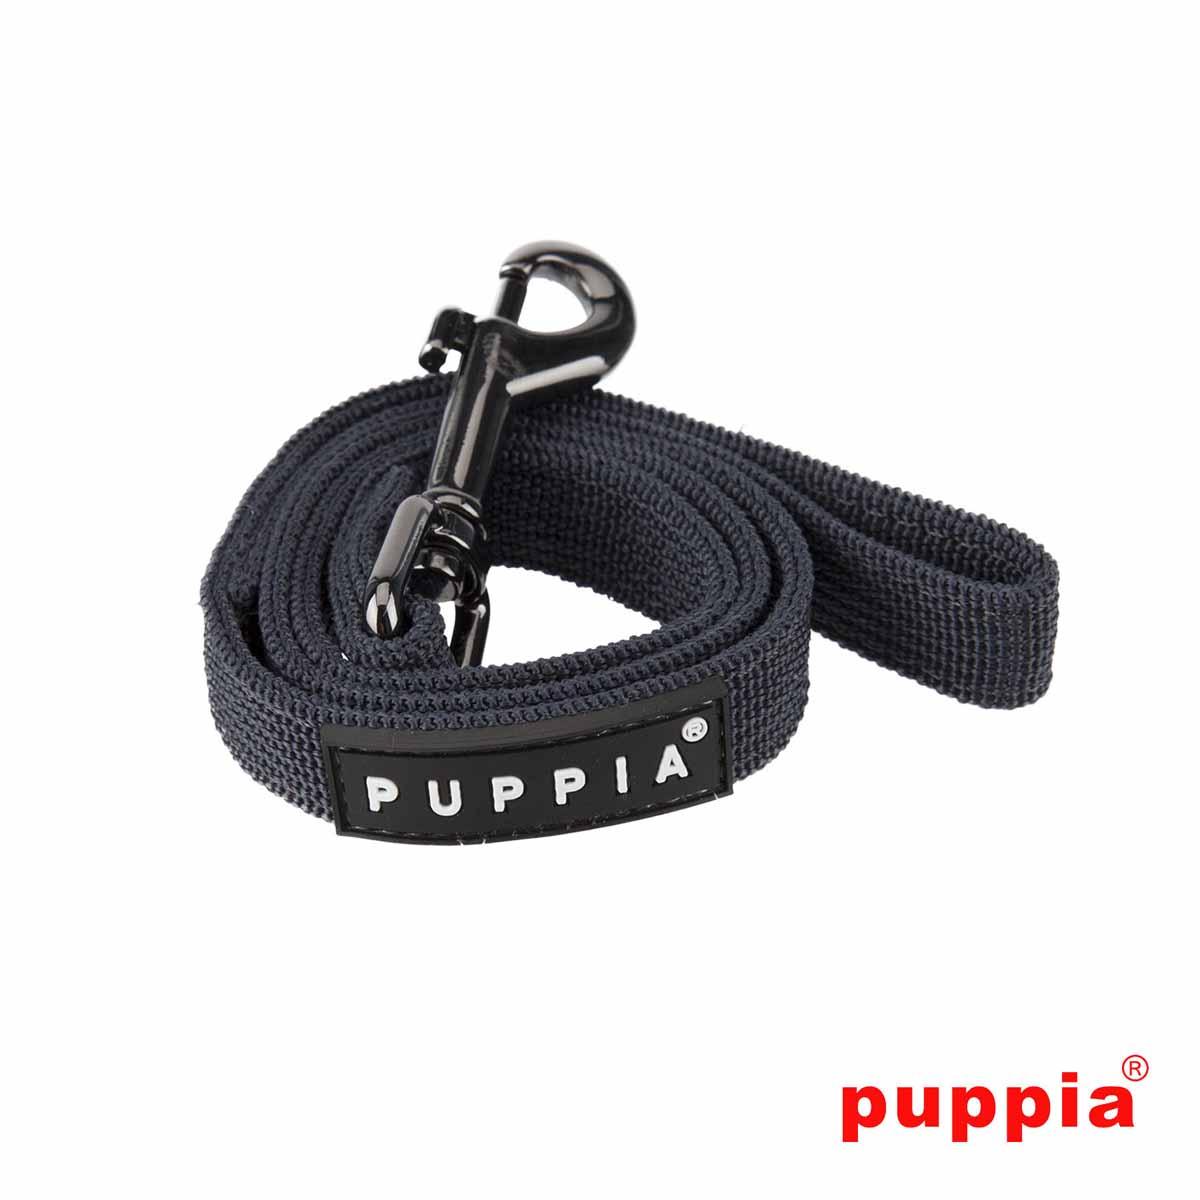 Basic Dog Leash by Puppia - Gray